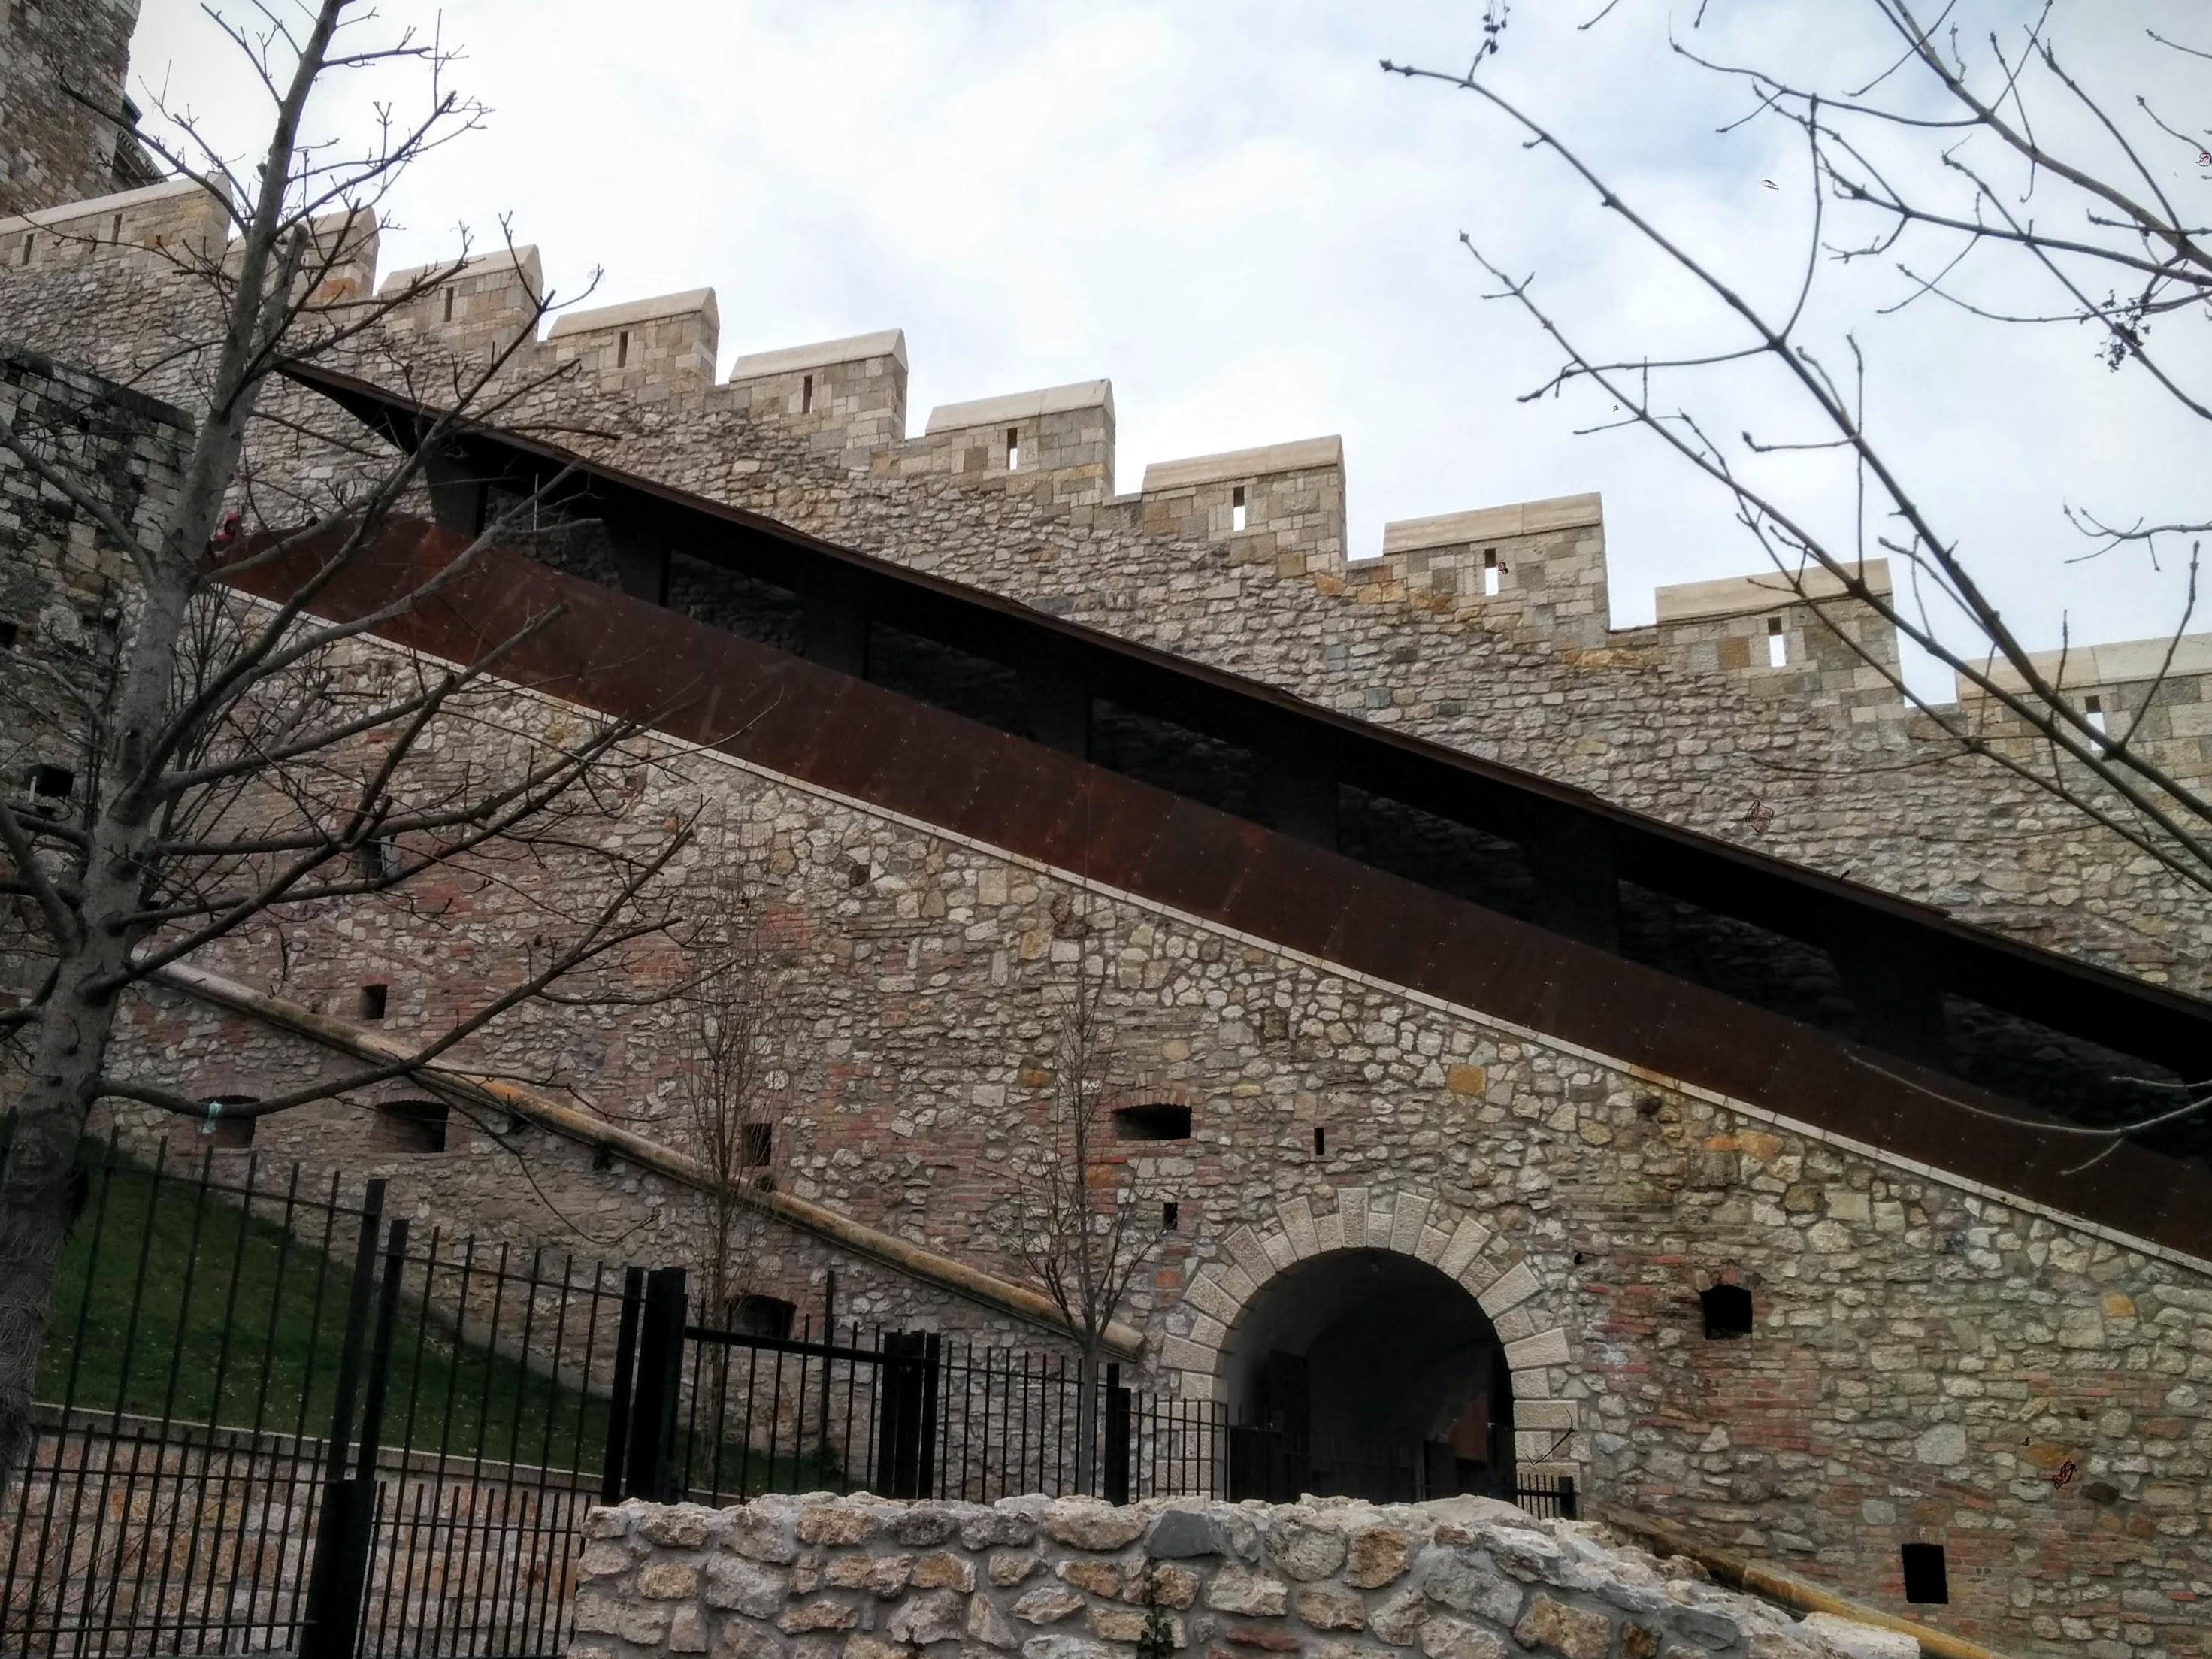 Várkert Bazár stairs